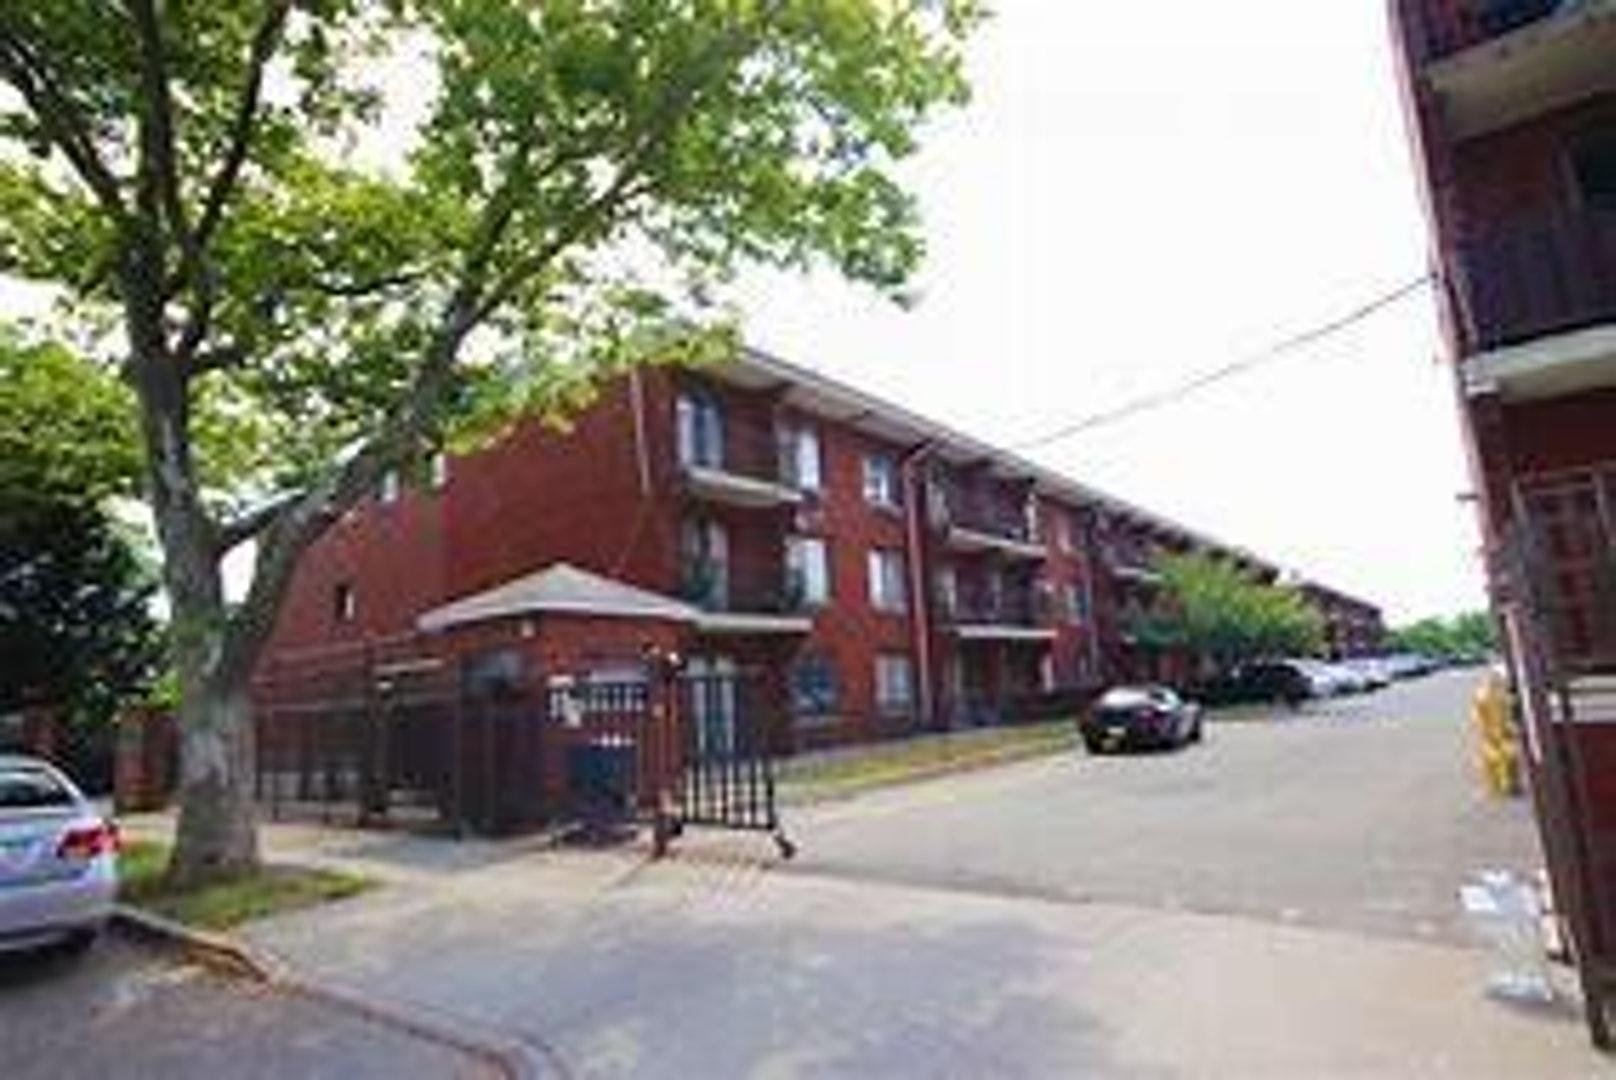 108-27 Seaview Avenue Canarsie Brooklyn NY 11236